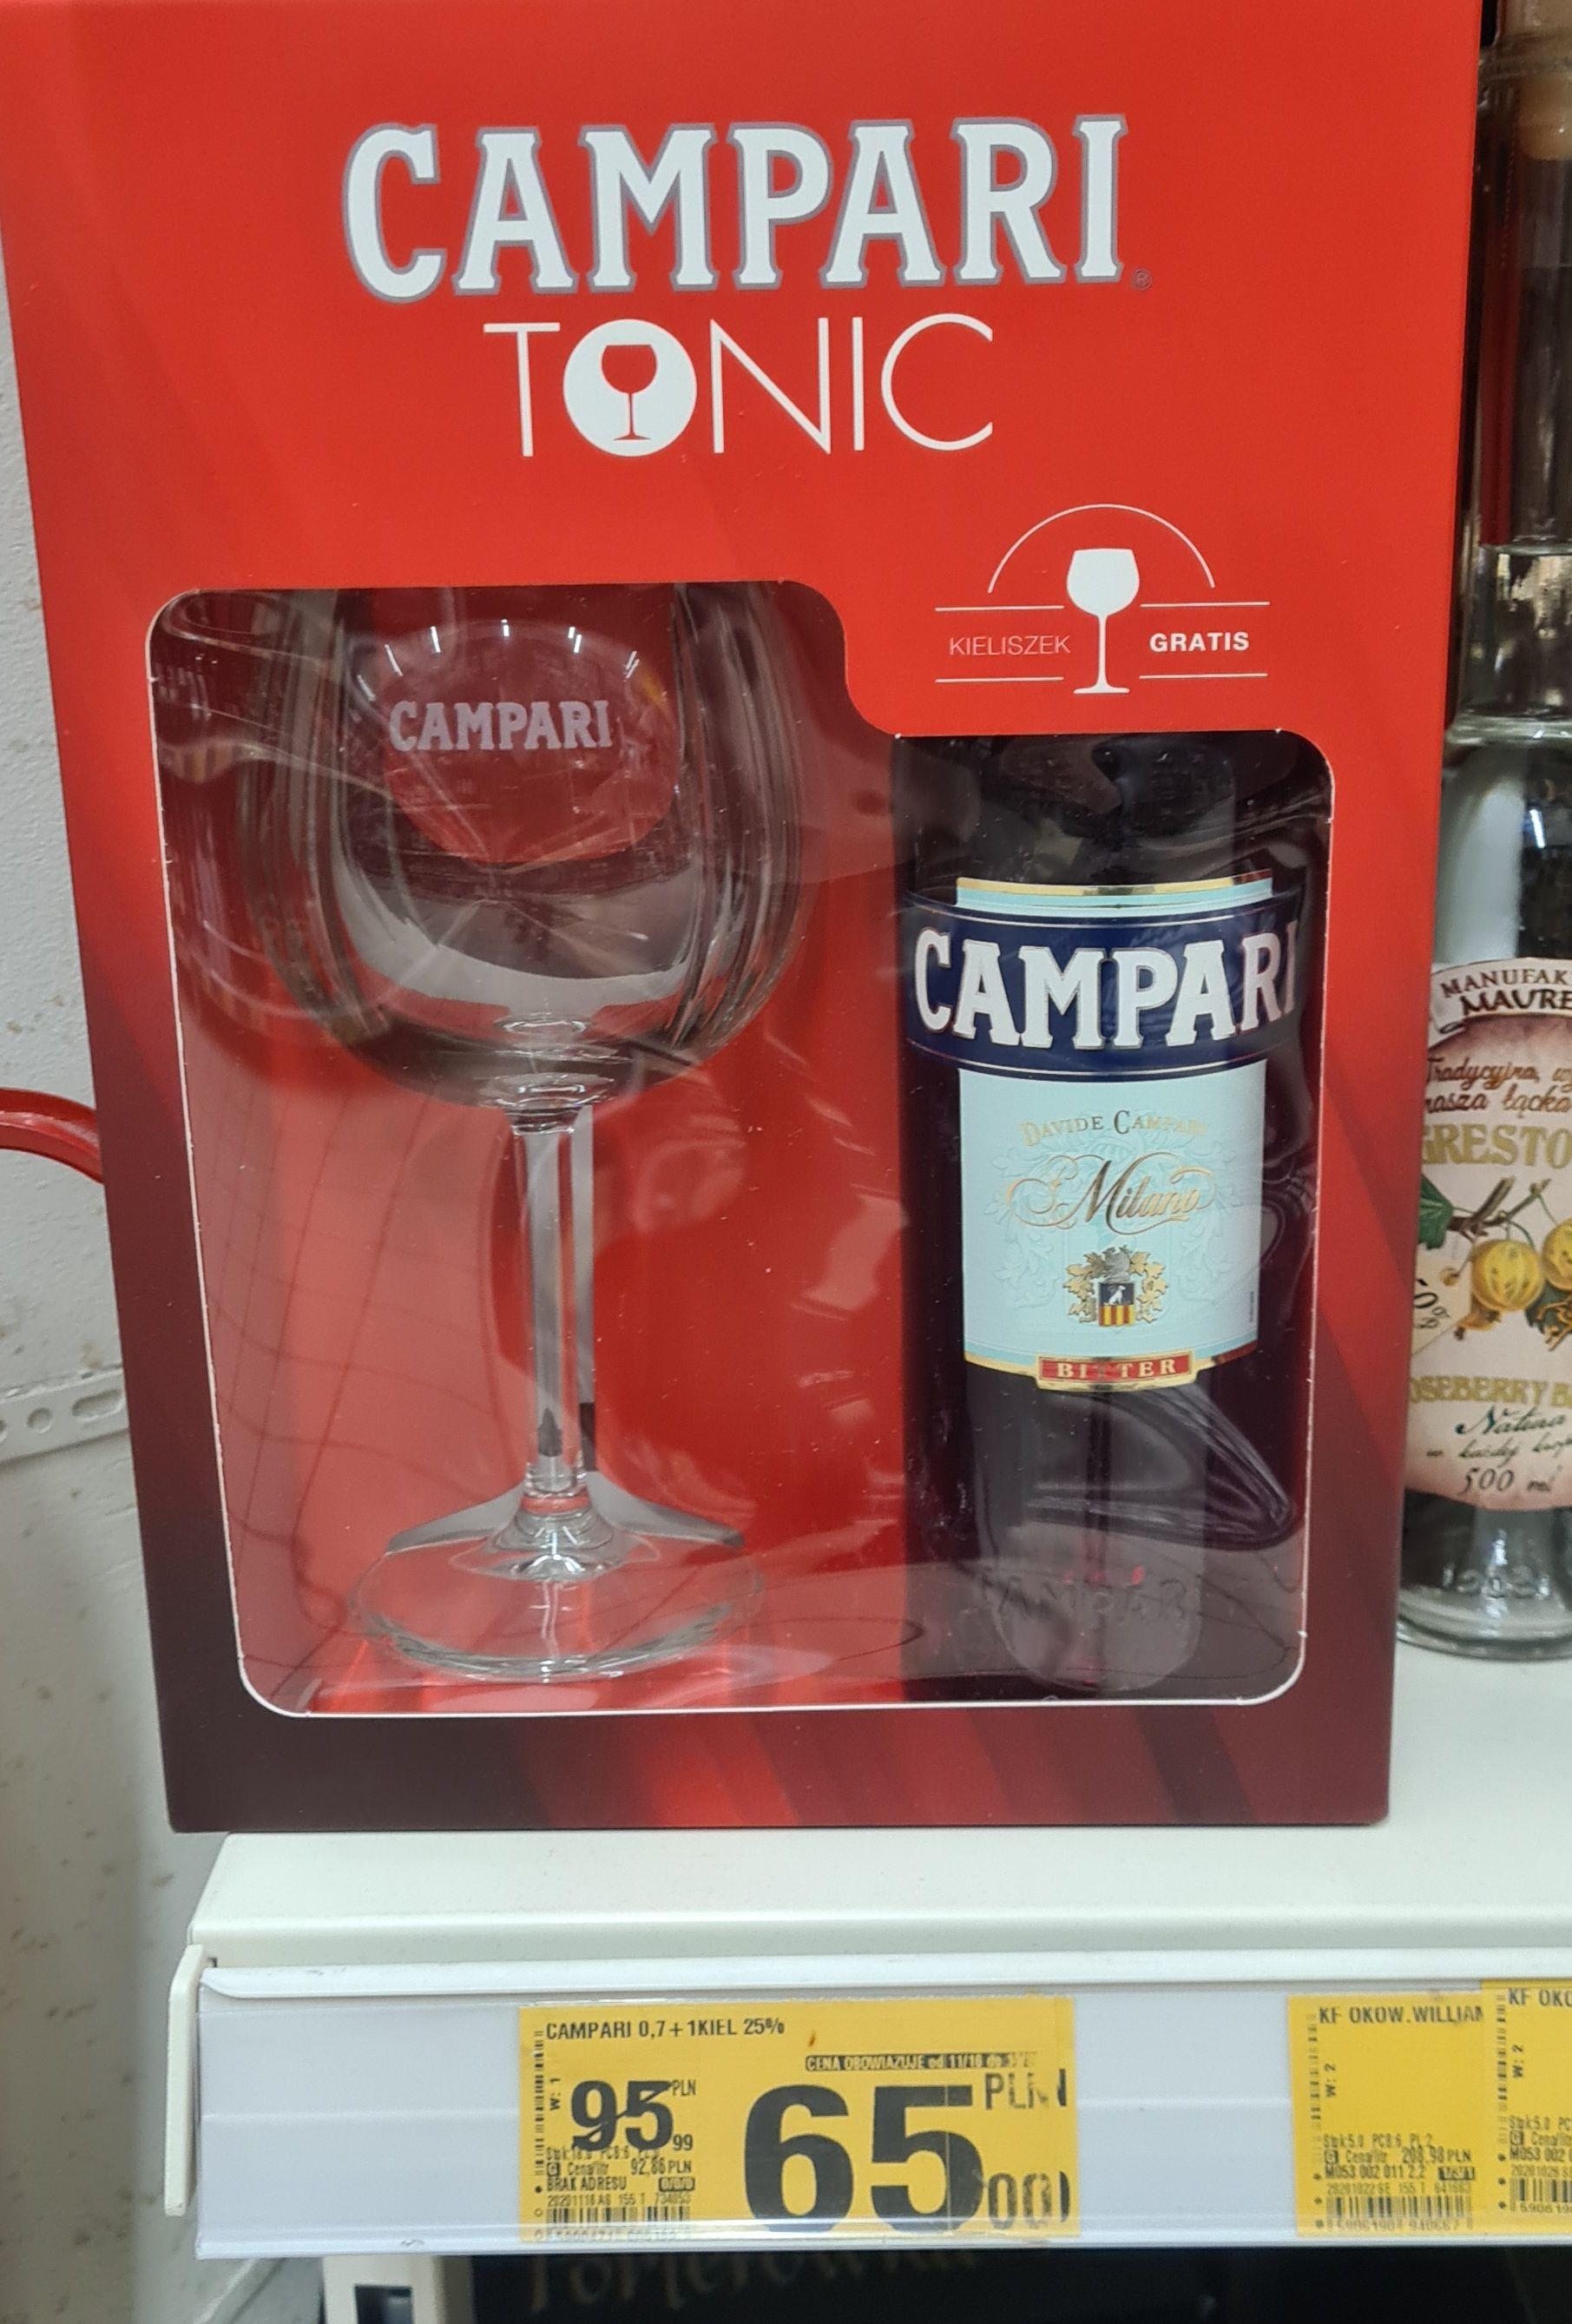 Campari Tonic 0.7 + kieliszek